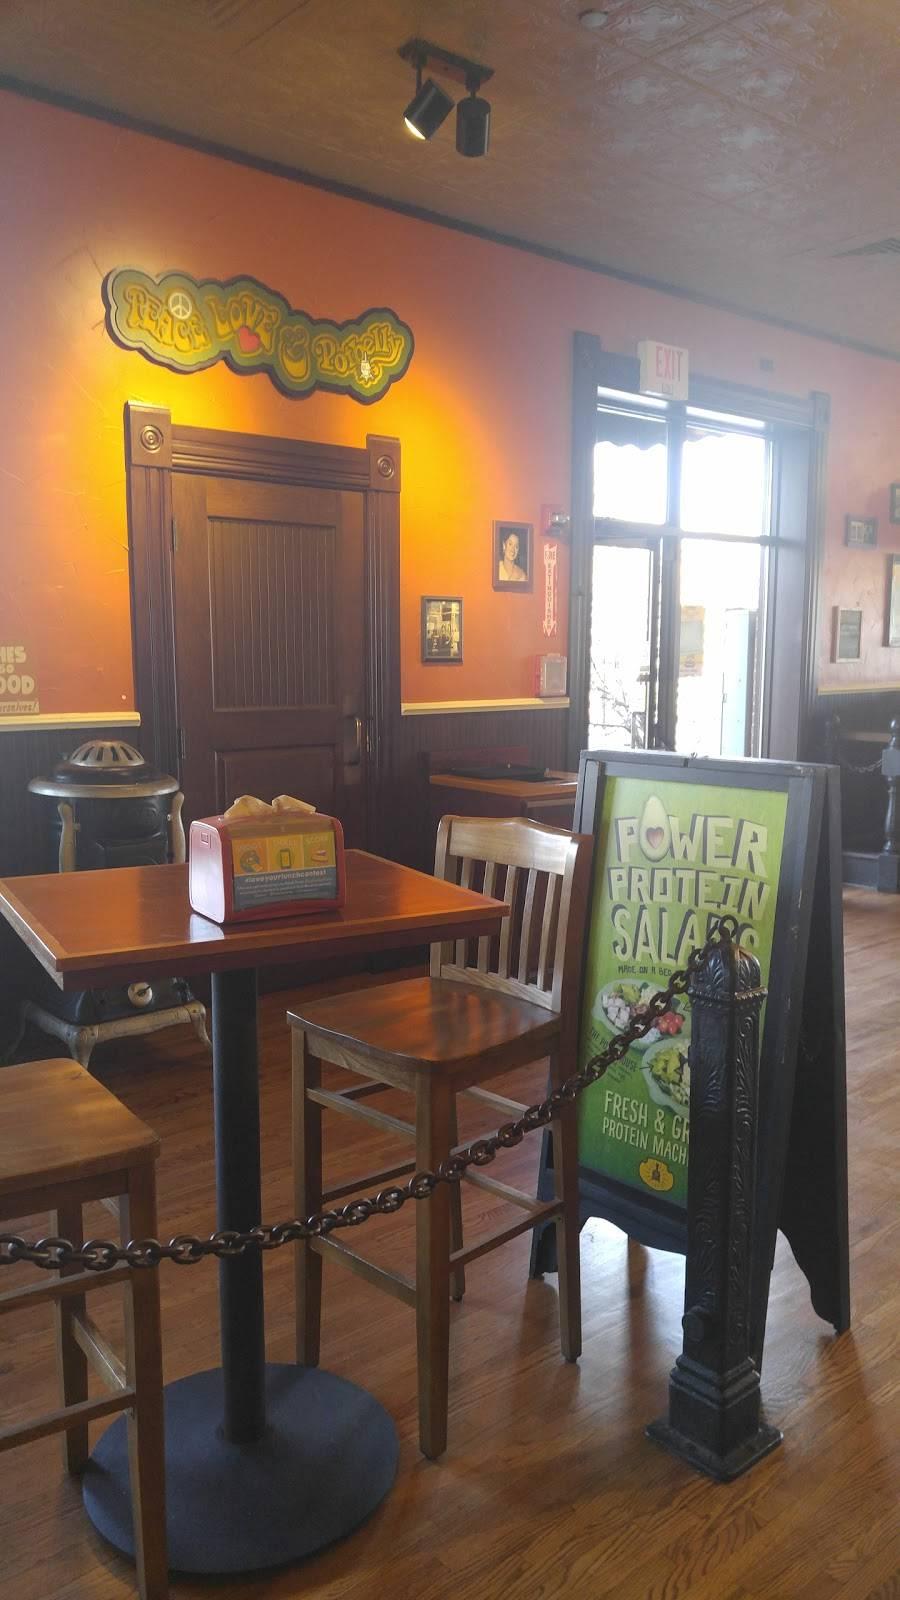 Potbelly Sandwich Shop | restaurant | 15825 South La Grange Road, Orland Park, IL 60462, USA | 7083640395 OR +1 708-364-0395